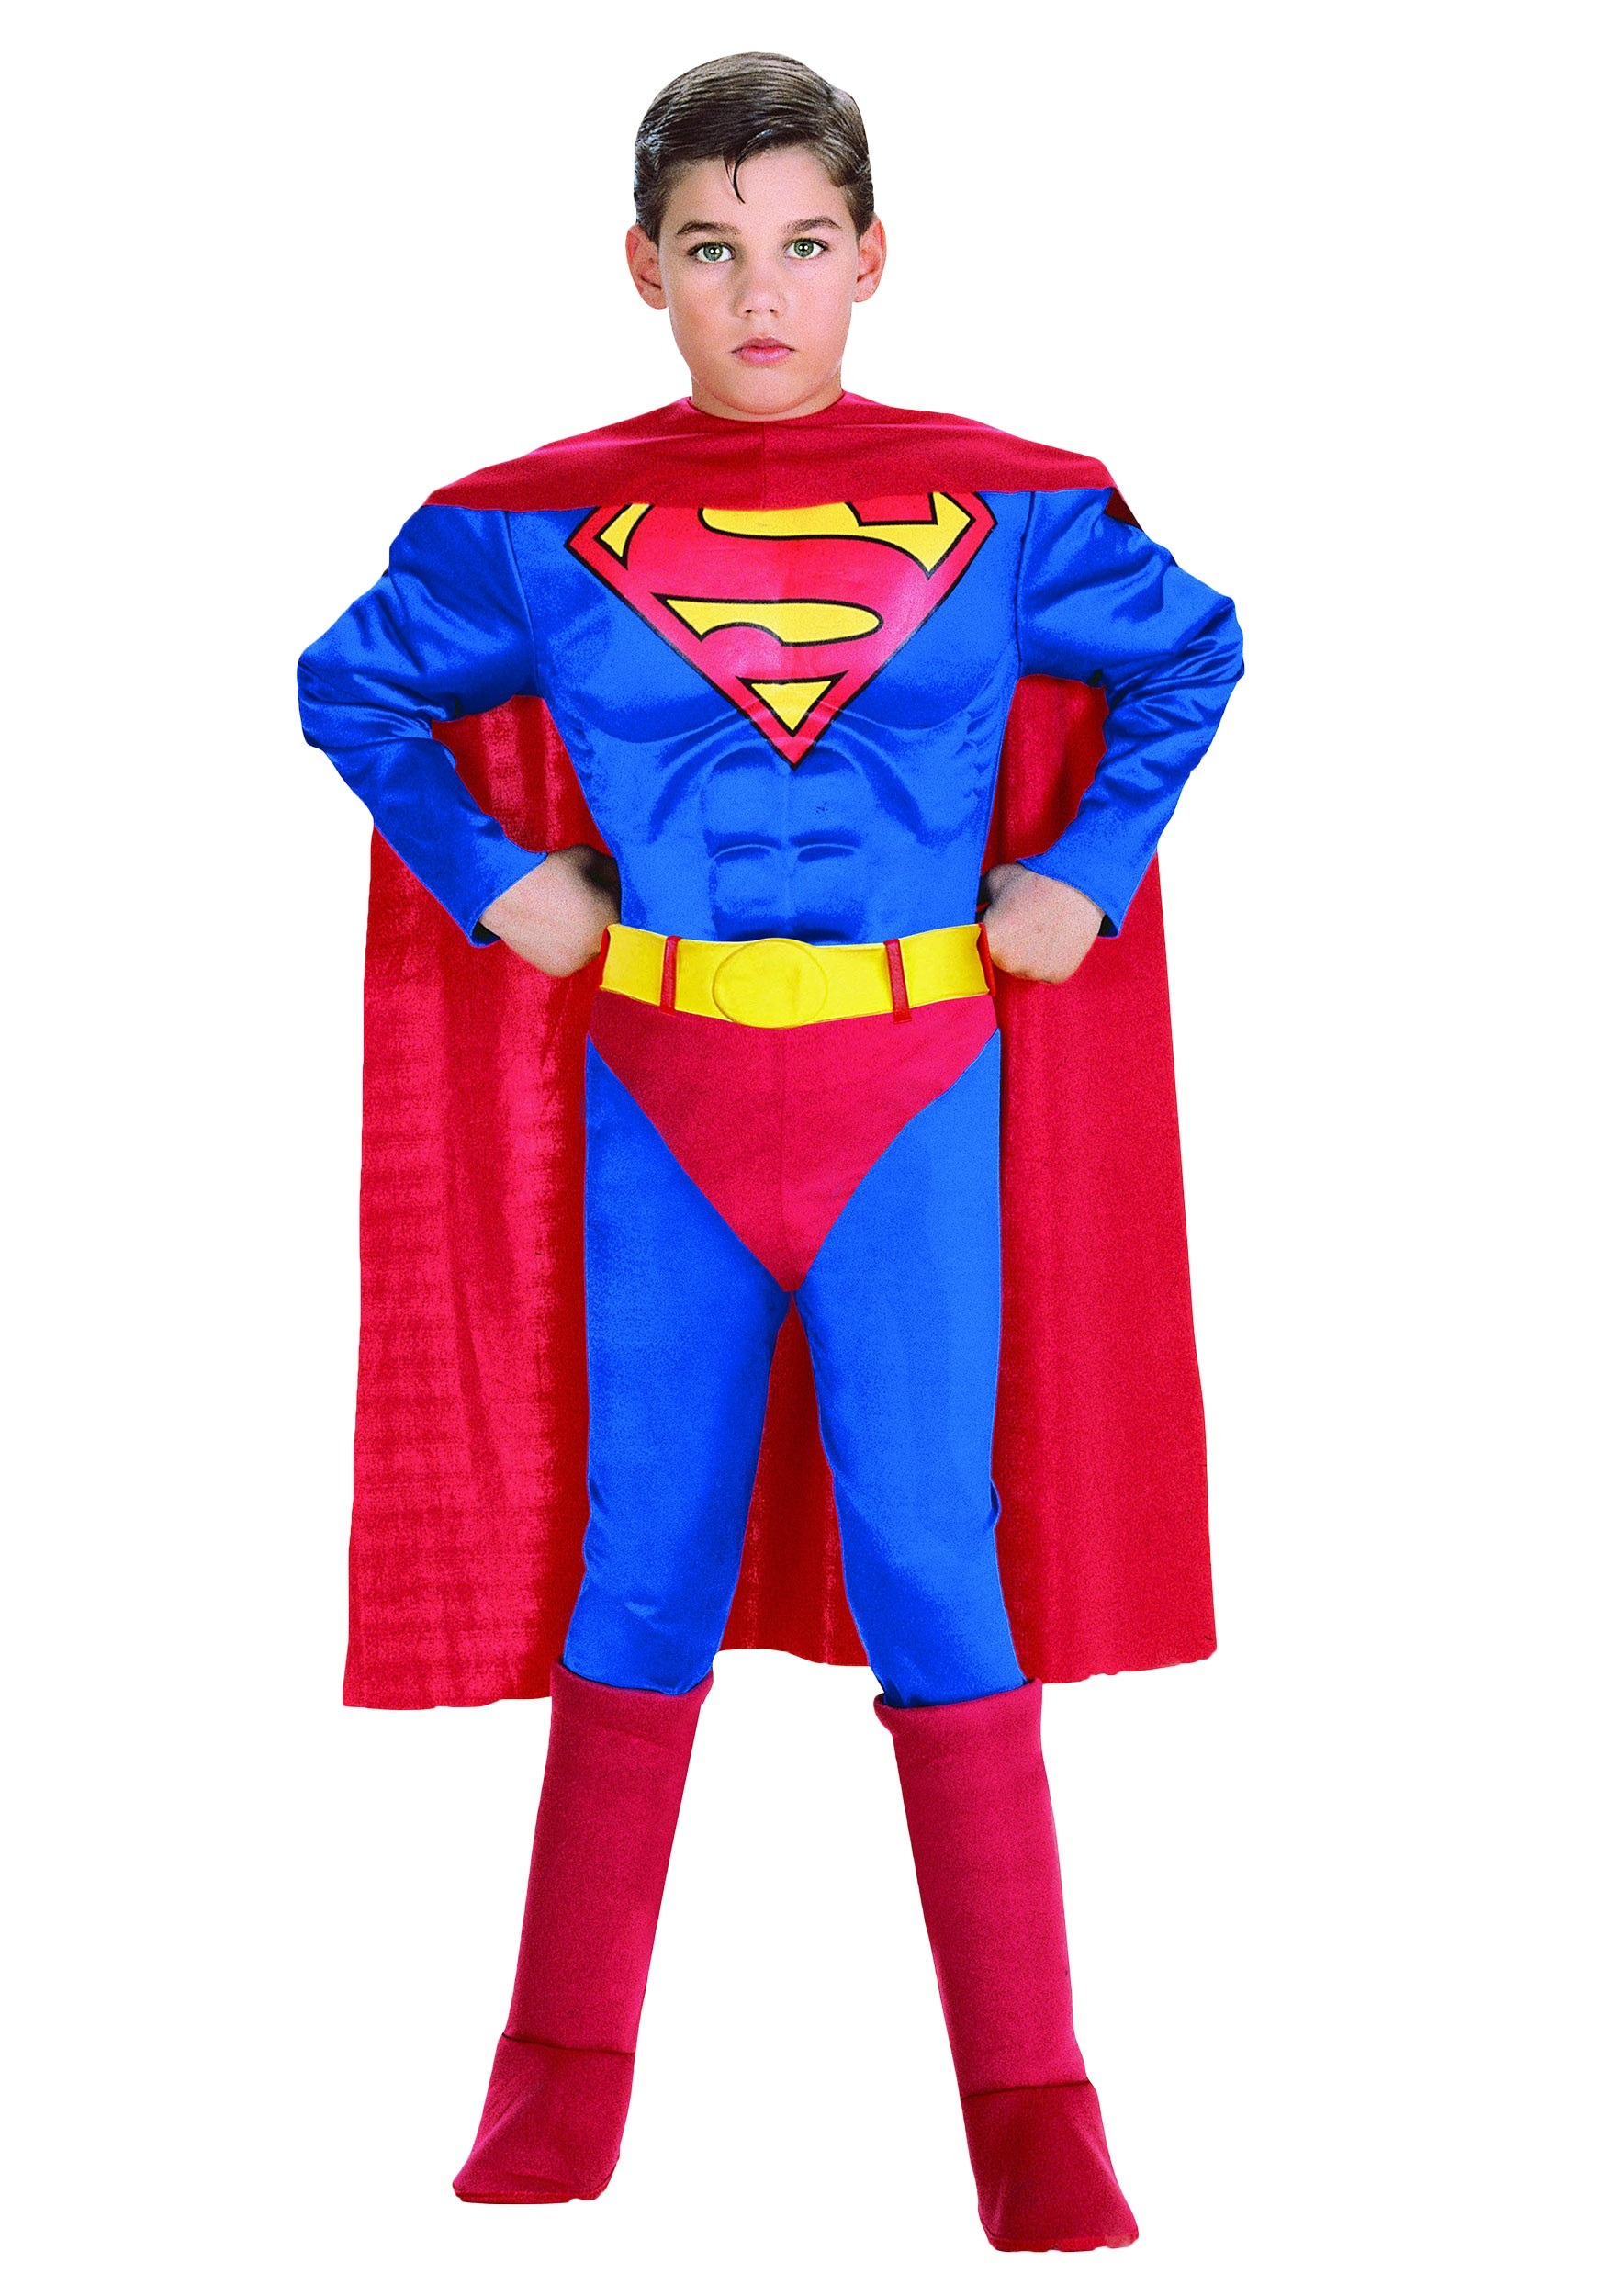 Child Deluxe Superman Costume  sc 1 st  Halloween Costumes & Child Deluxe Superman Costume - Kids Superman Halloween Costumes